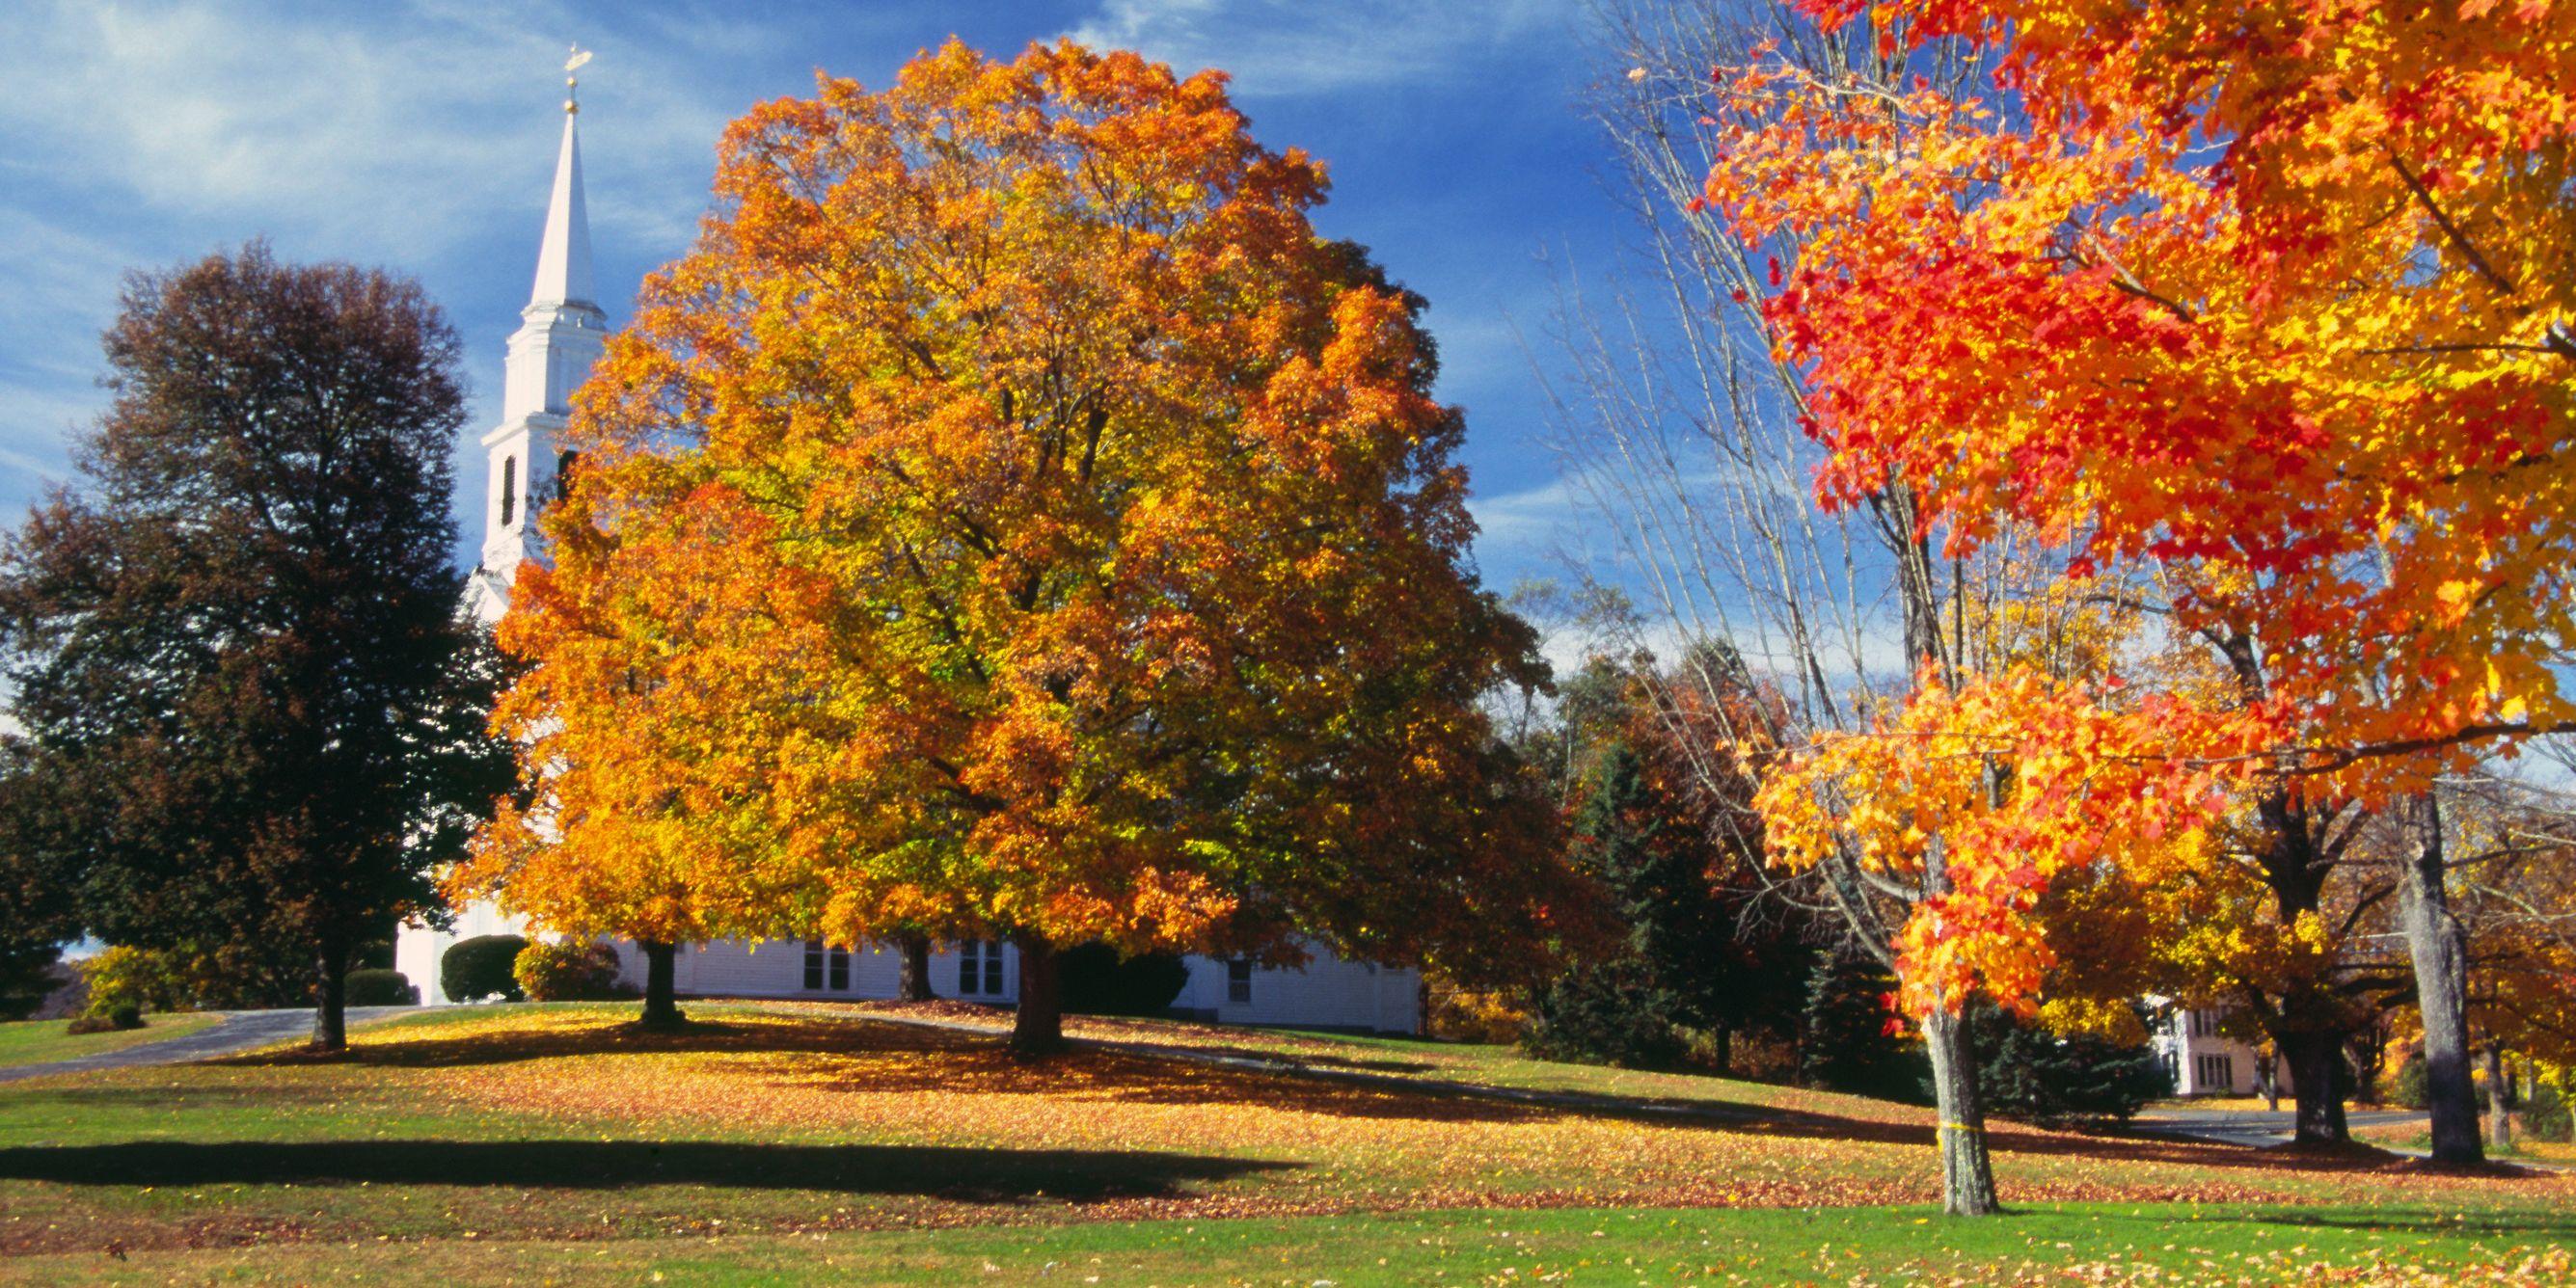 Berkshires, MA - fall foliage